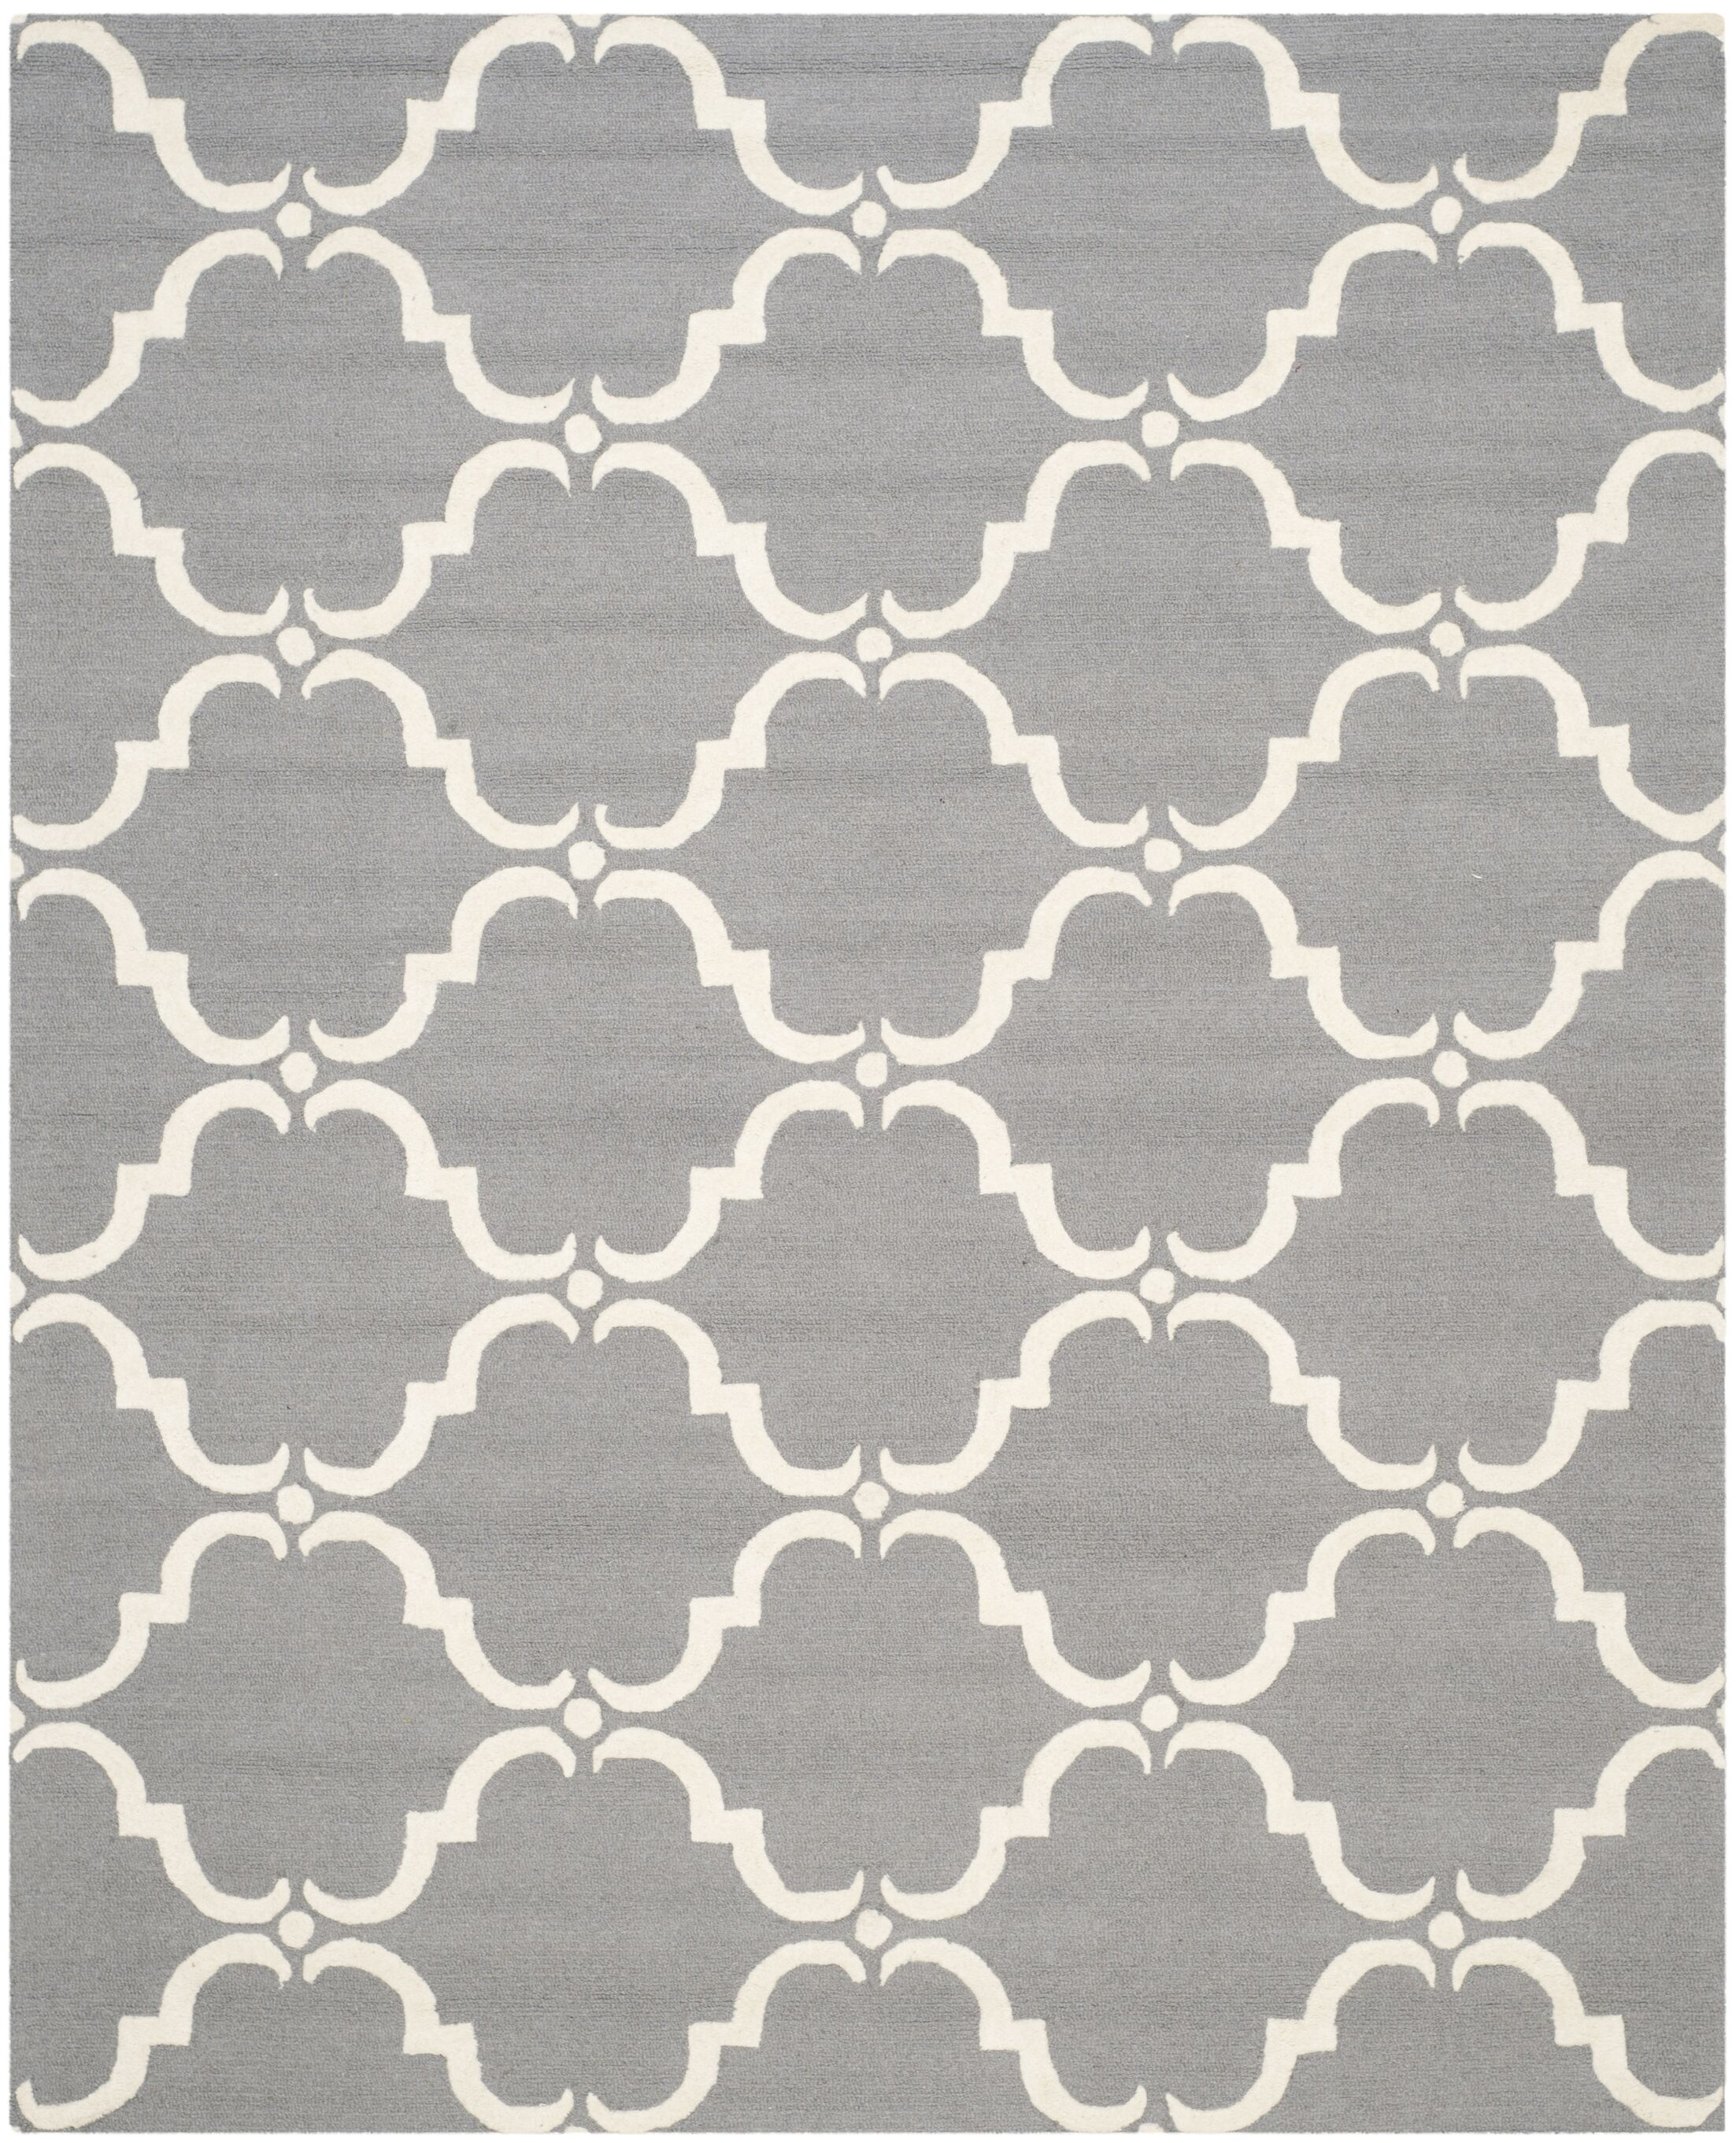 Cambridge Tufted Wool Dark Gray/Ivory Area Rug Rug Size: Rectangle 8' x 10'